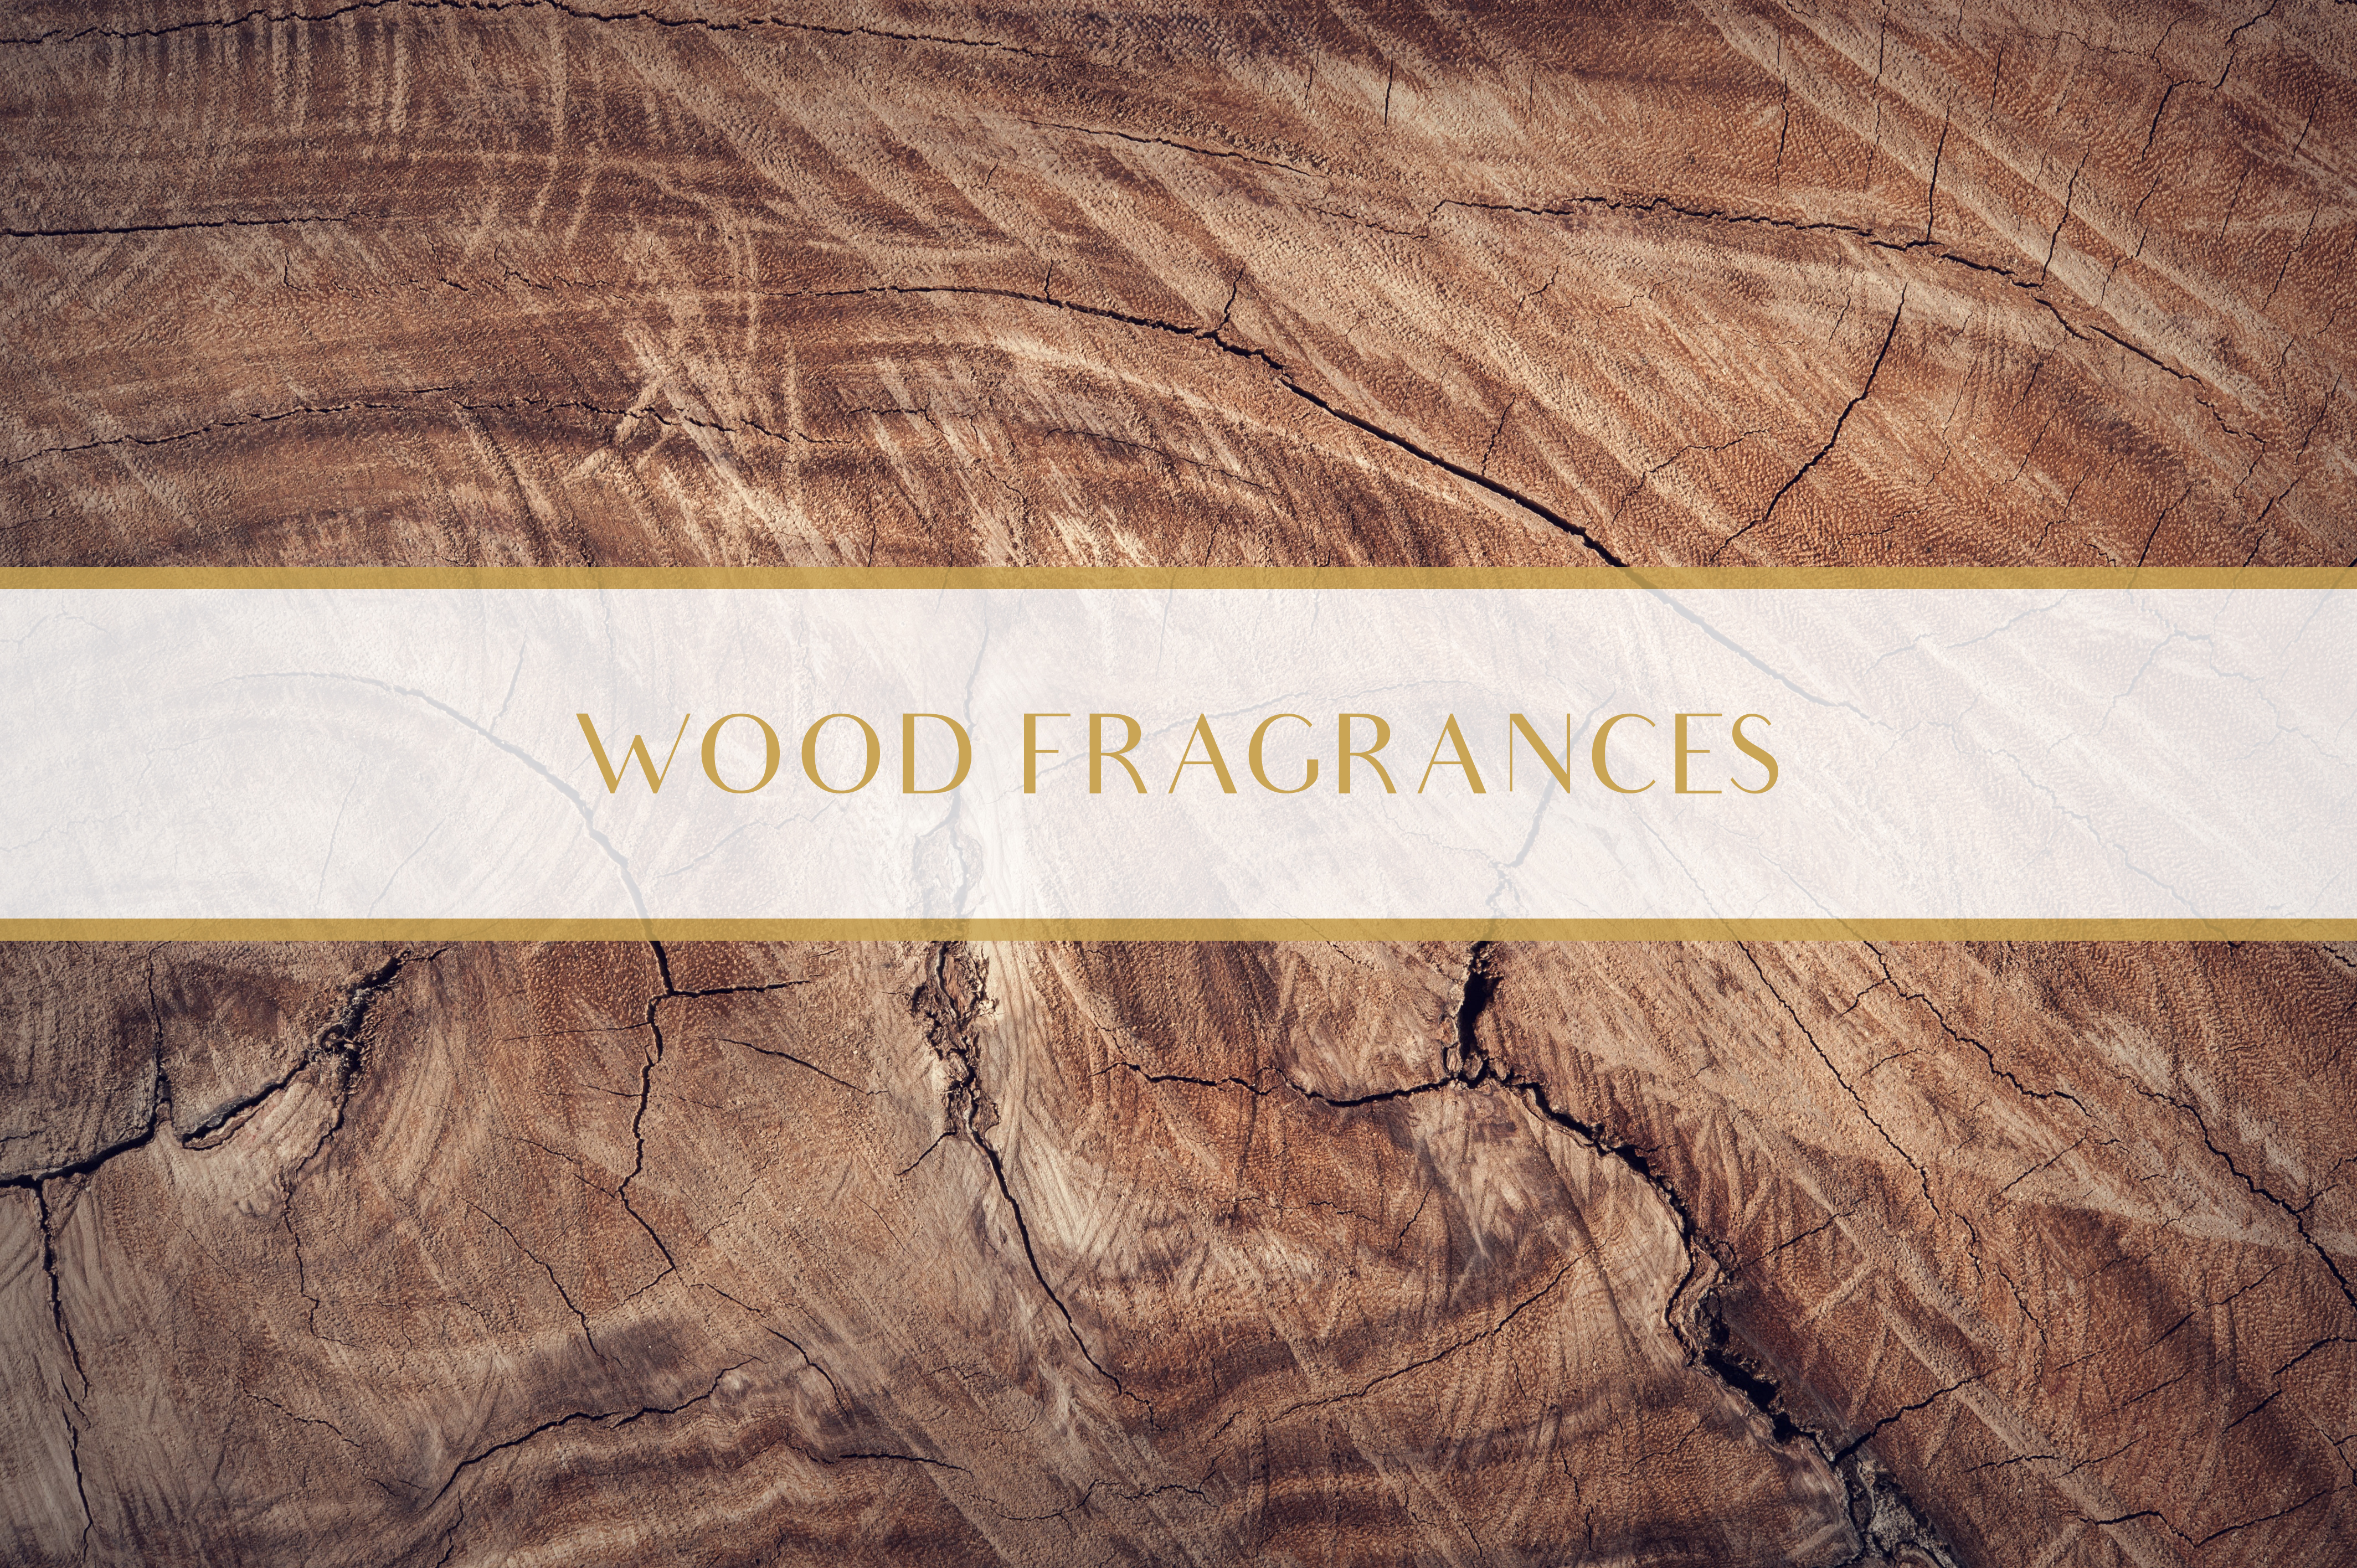 Wood Fragrances